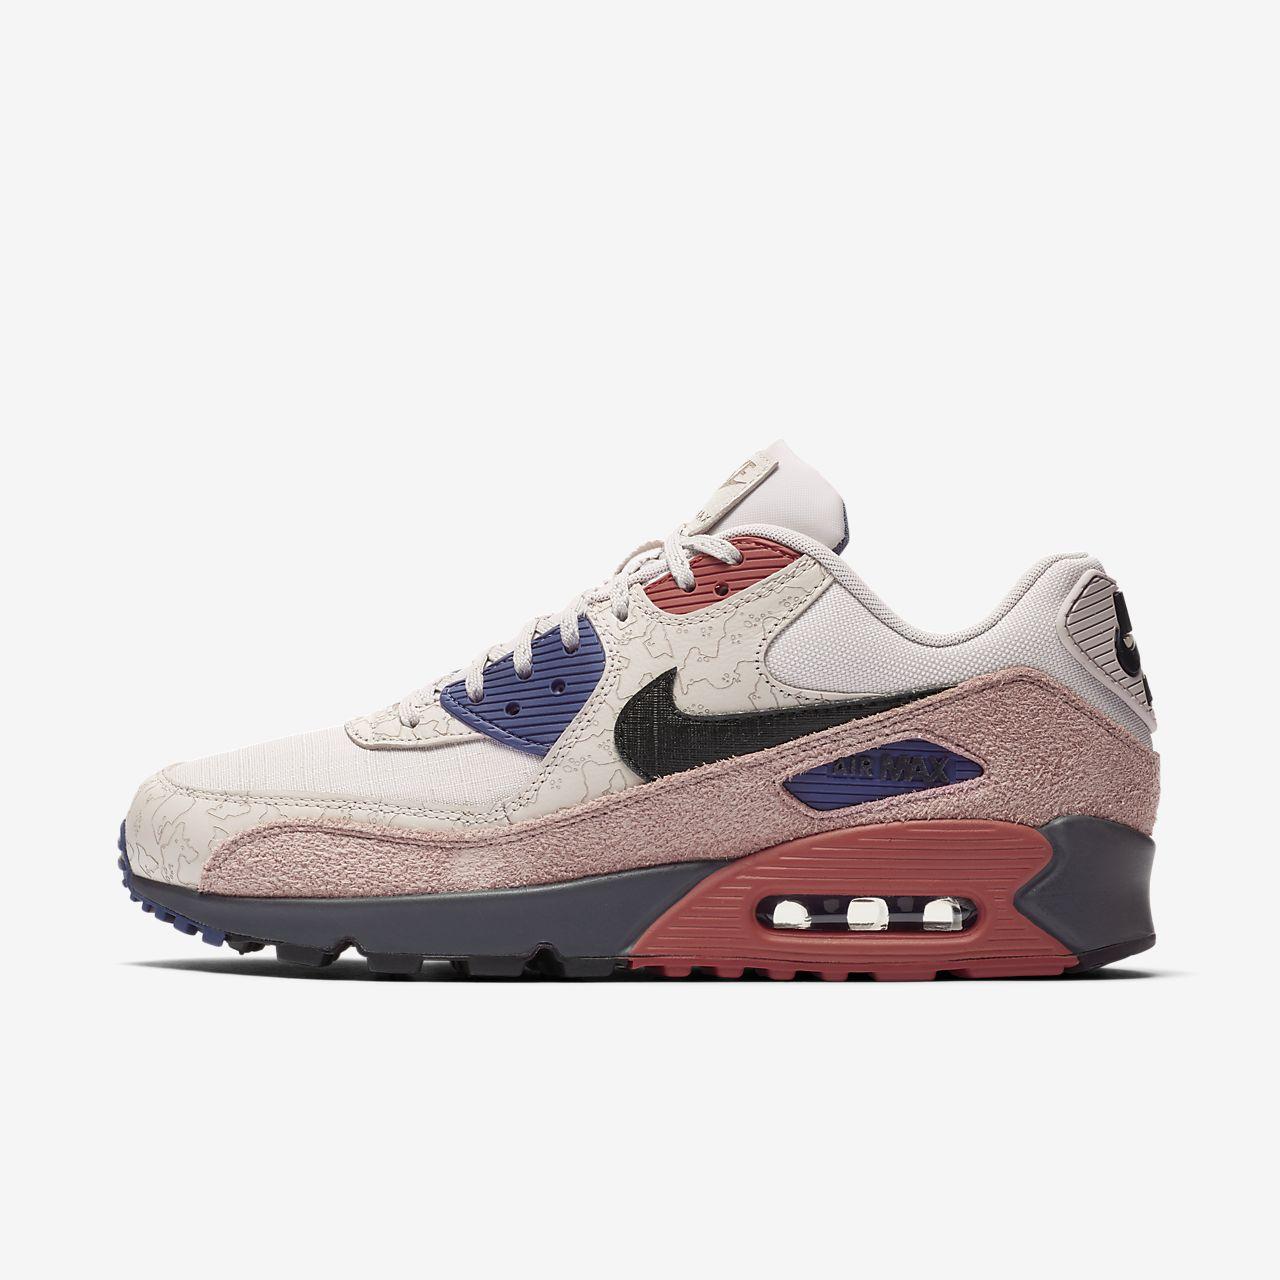 nike air max 90 running shoes